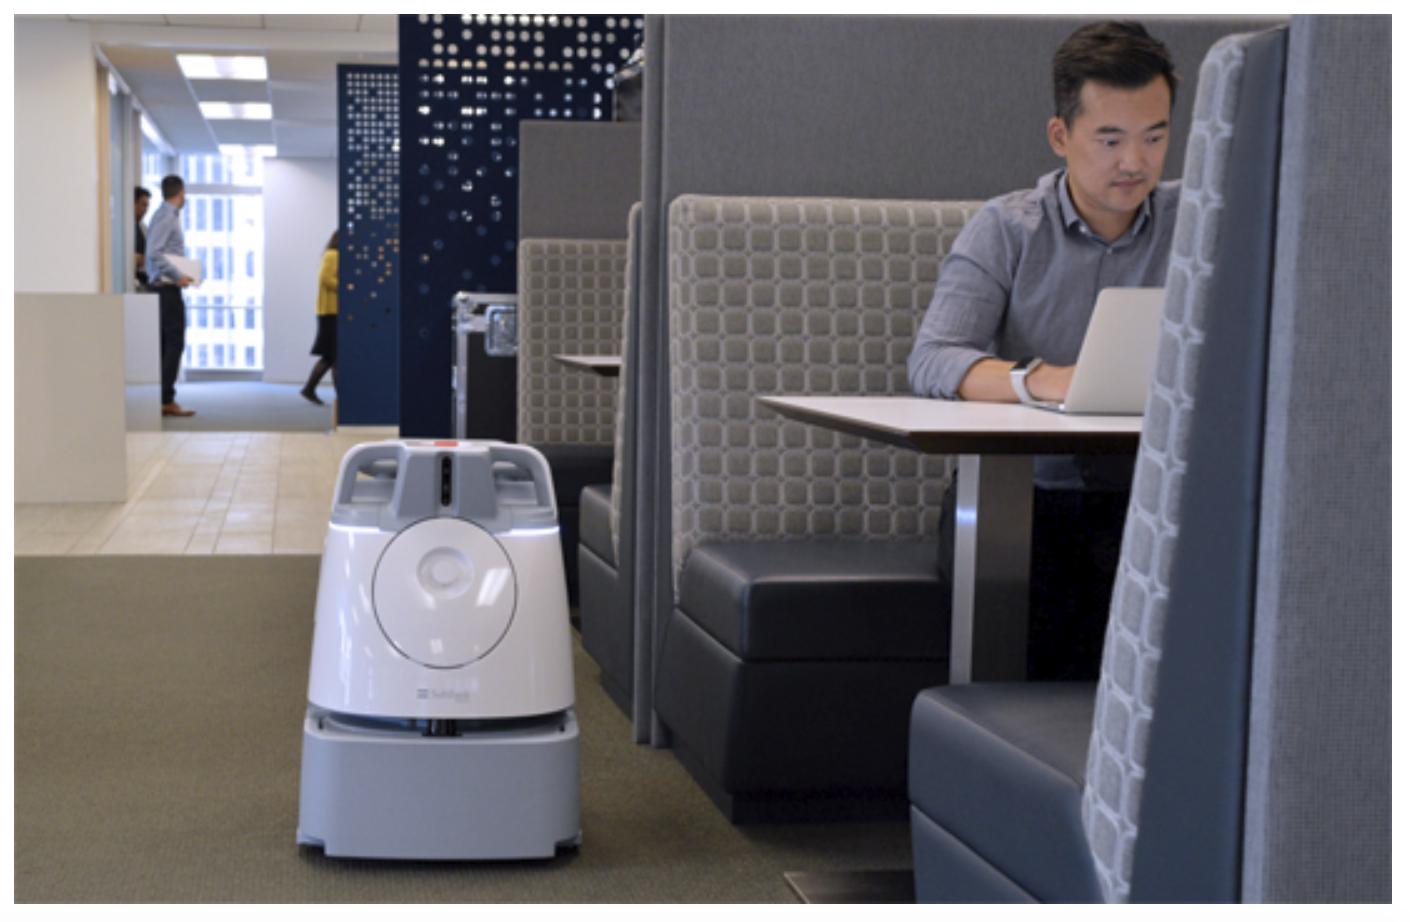 Brain raises $36m to expand robotics AI business